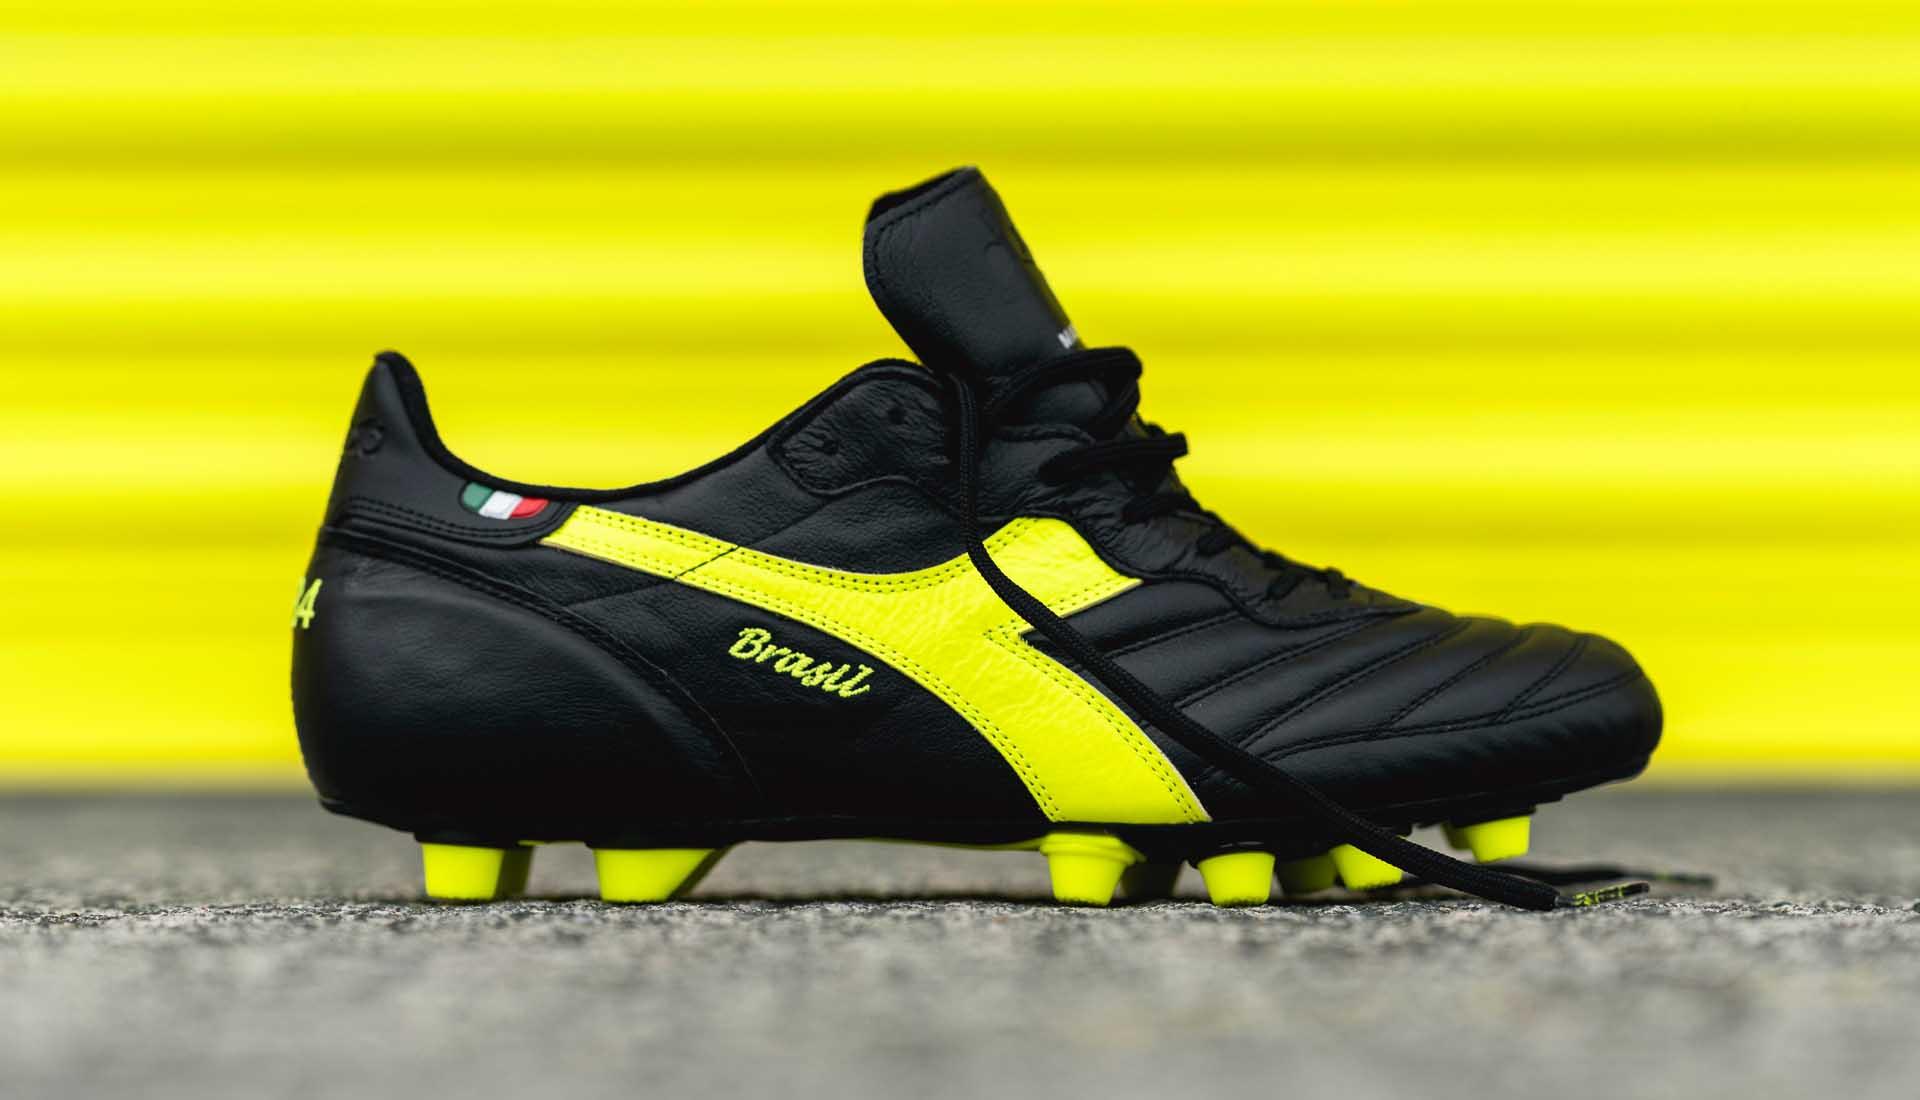 Brasil 'Made In Italy' K-Leather Pro